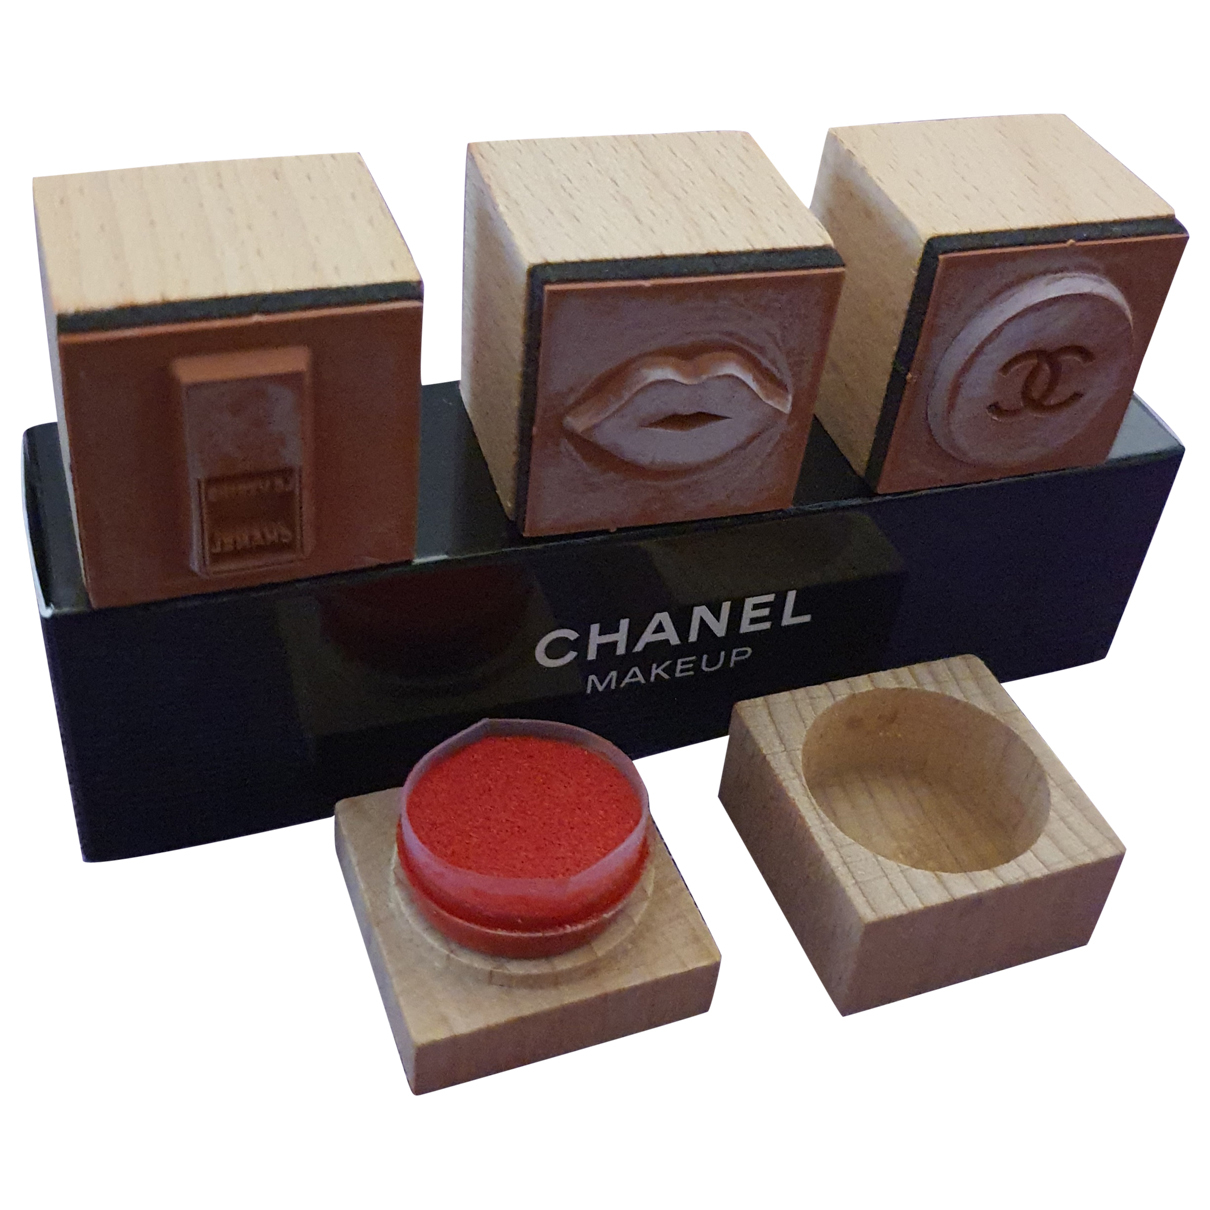 Objeto de decoracion Chanel